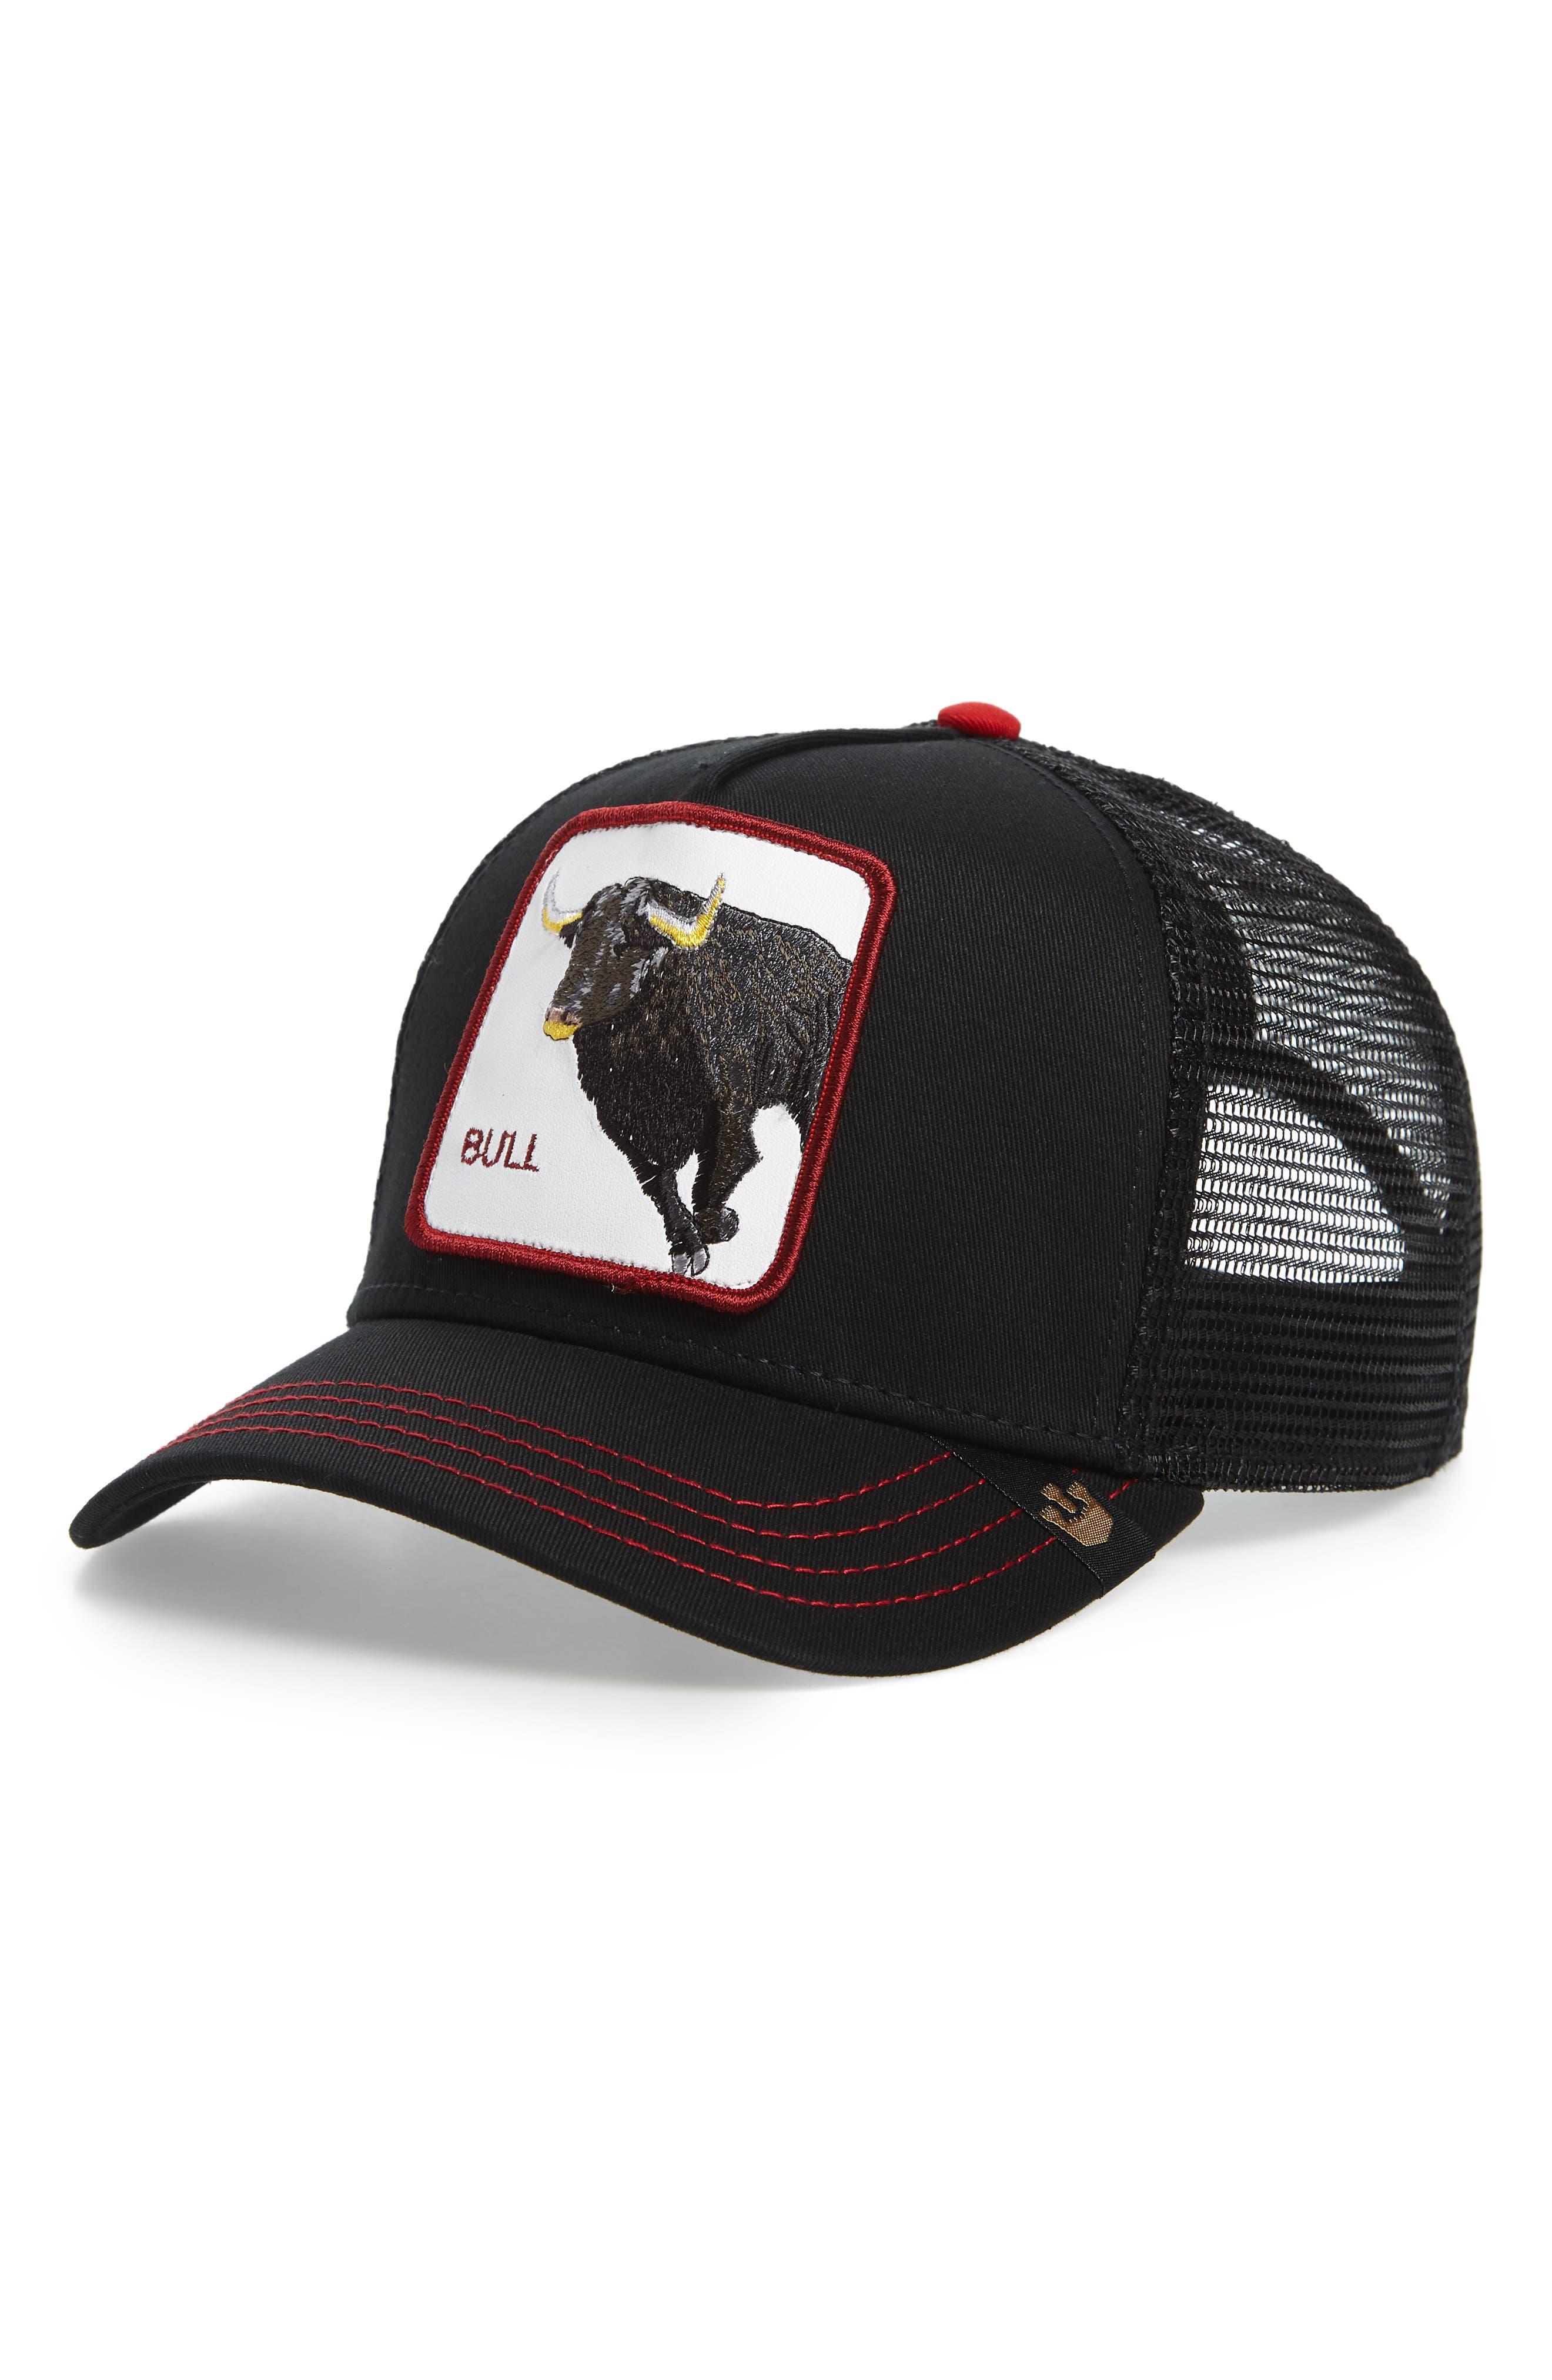 d856561e1 Men's Hats, Hats for Men | Nordstrom